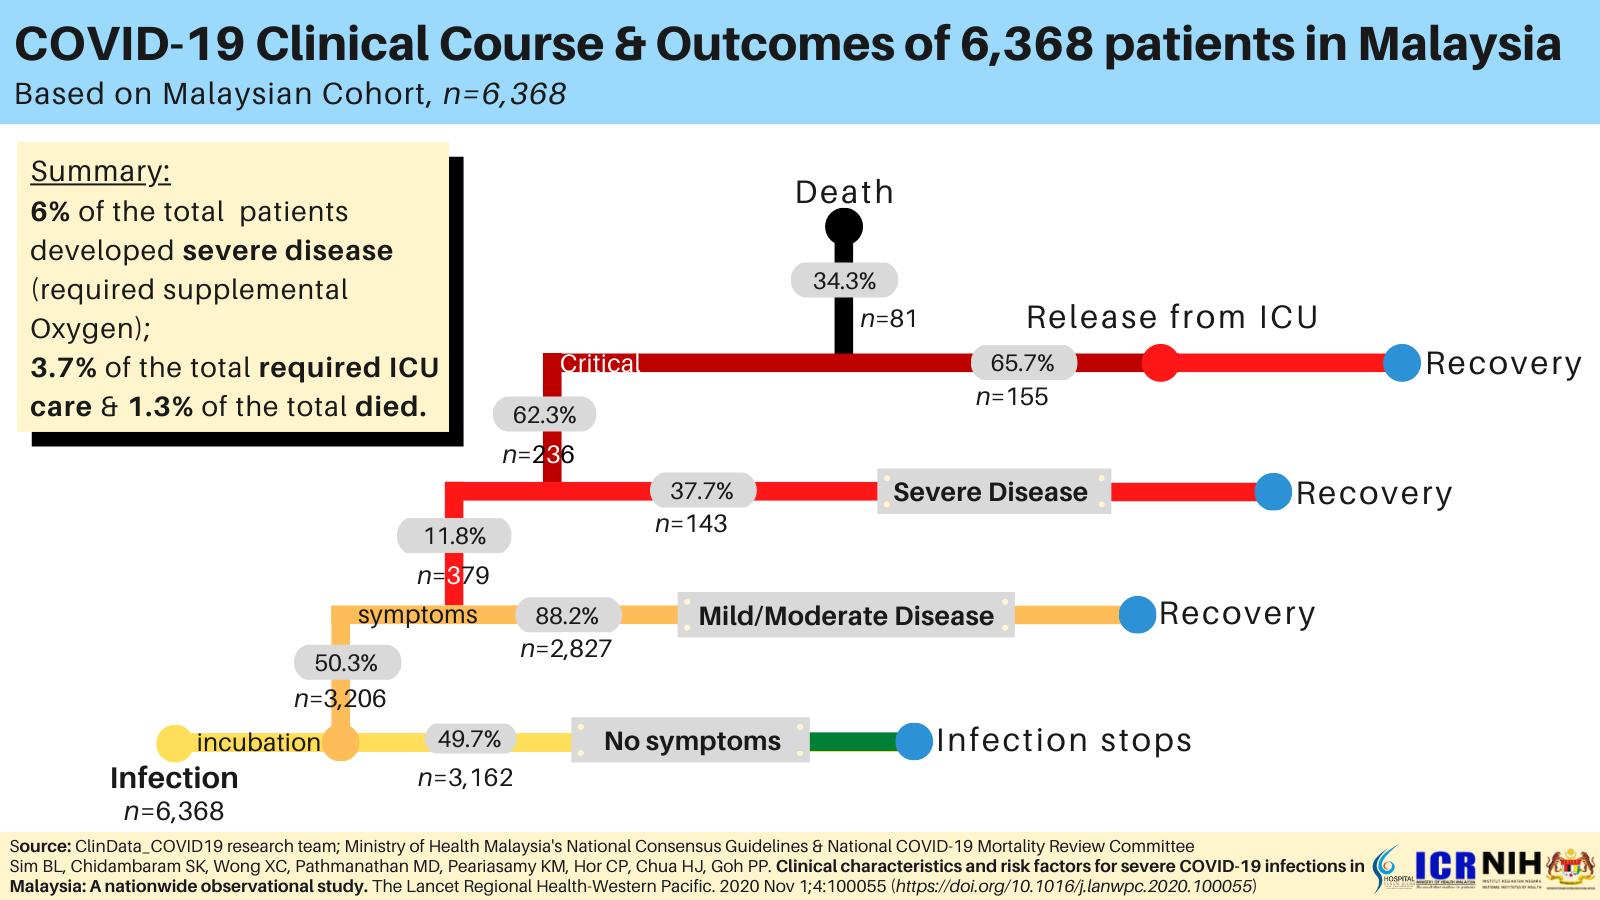 COVID-19 Clinical Course & Outcomes